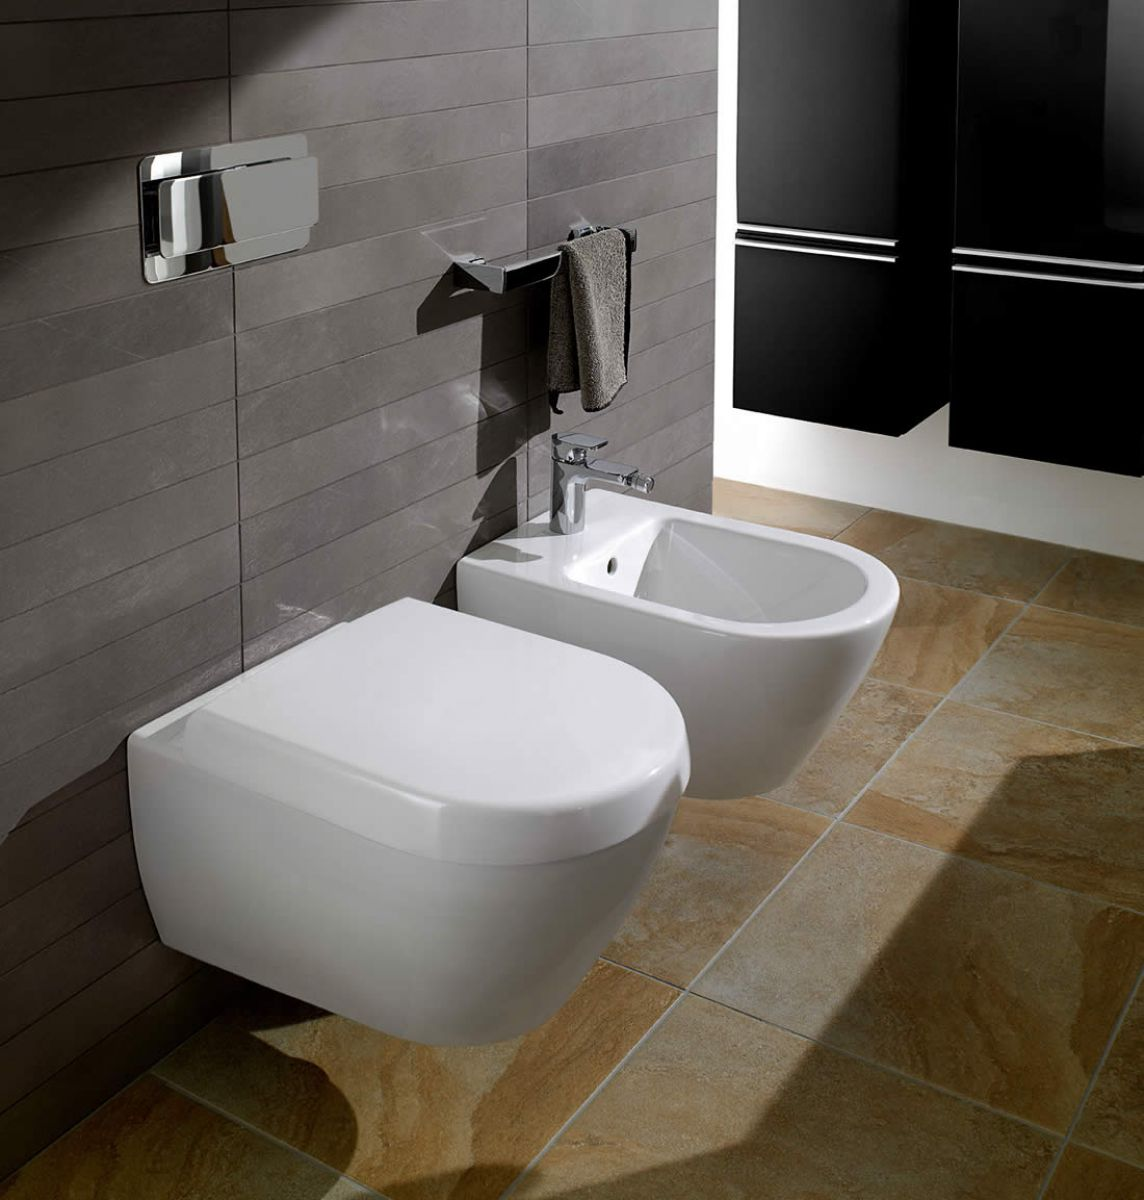 villeroy boch subway 2 0 wall mounted bidet uk bathrooms. Black Bedroom Furniture Sets. Home Design Ideas